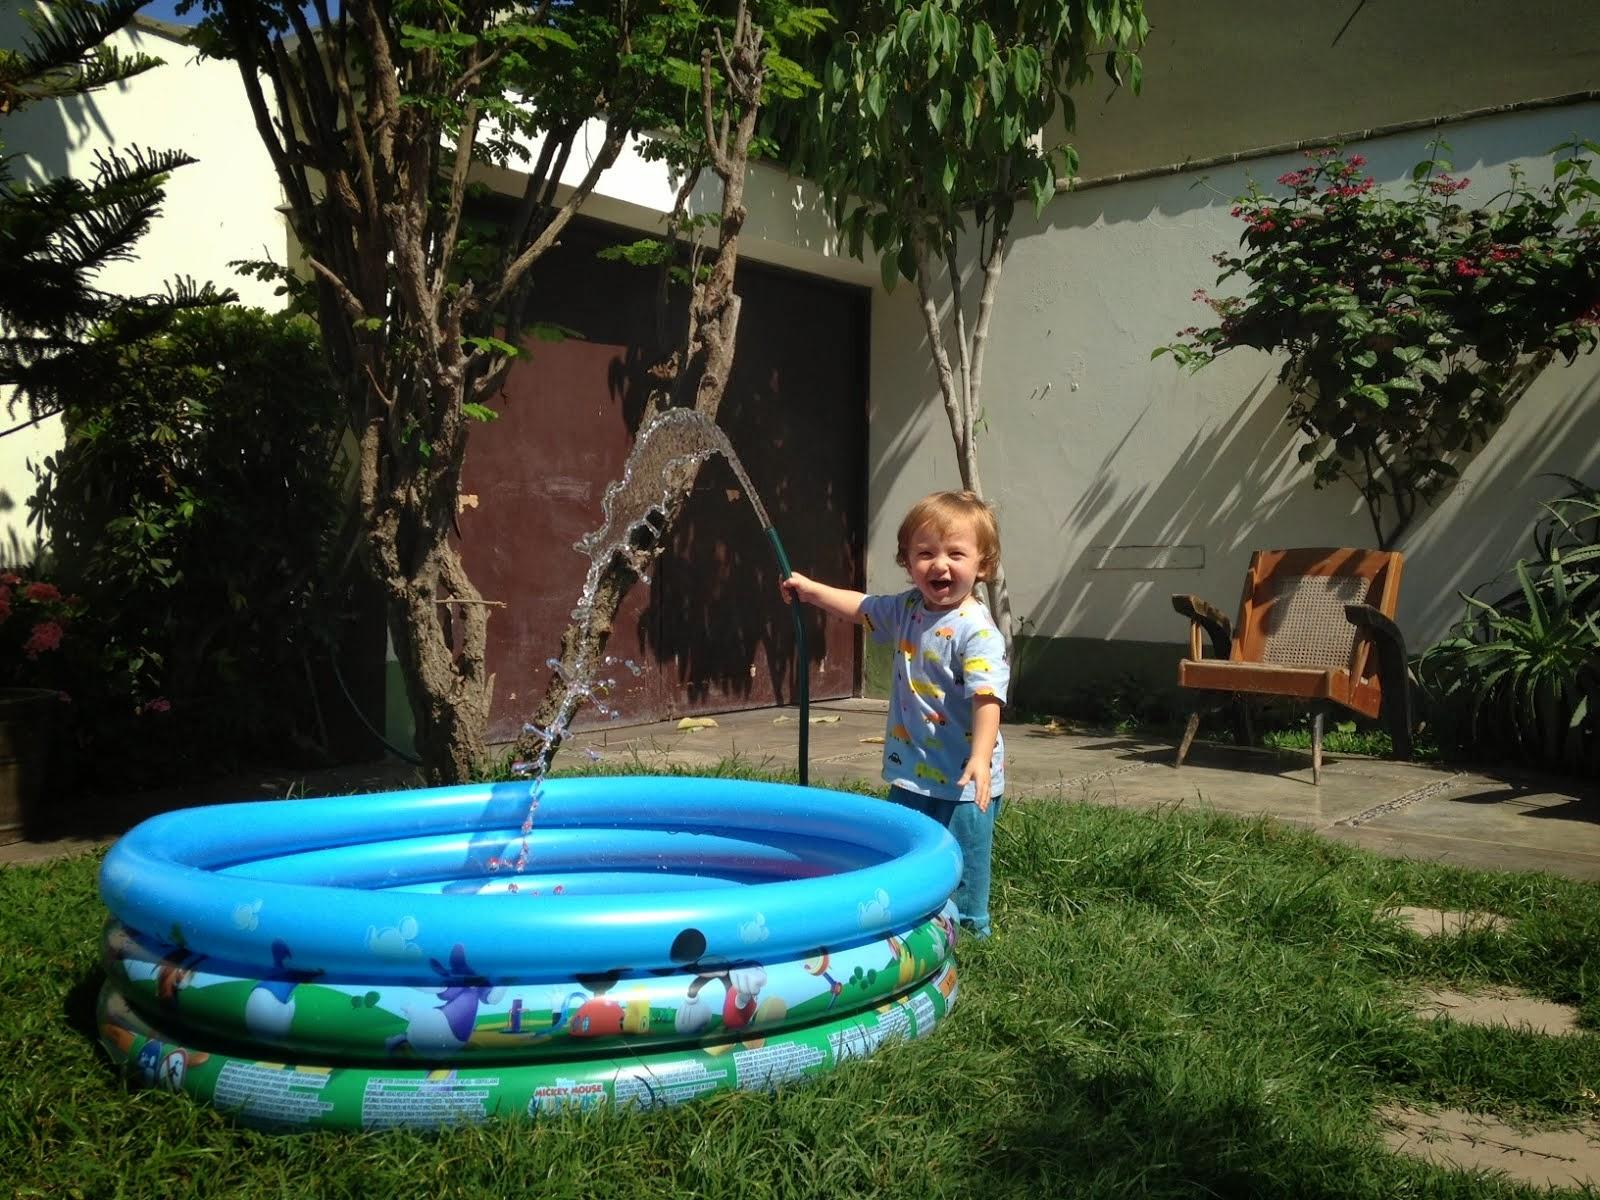 Pupazul la piscina del rey - Piscina arganda del rey ...